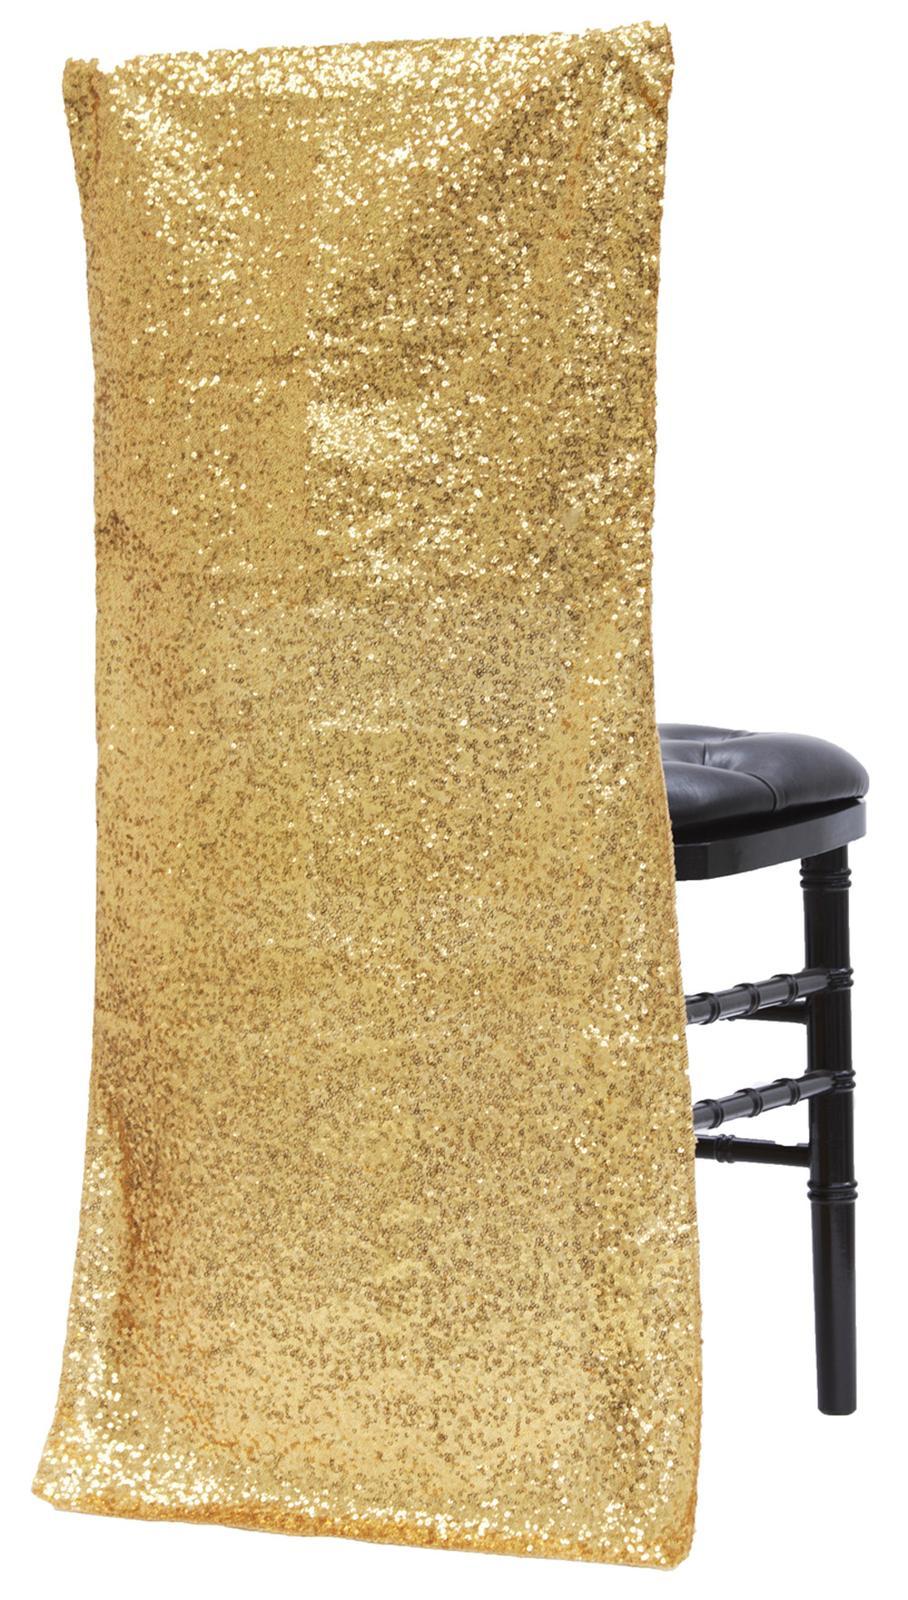 Návlek na chiavary stoličku - Obrázok č. 2